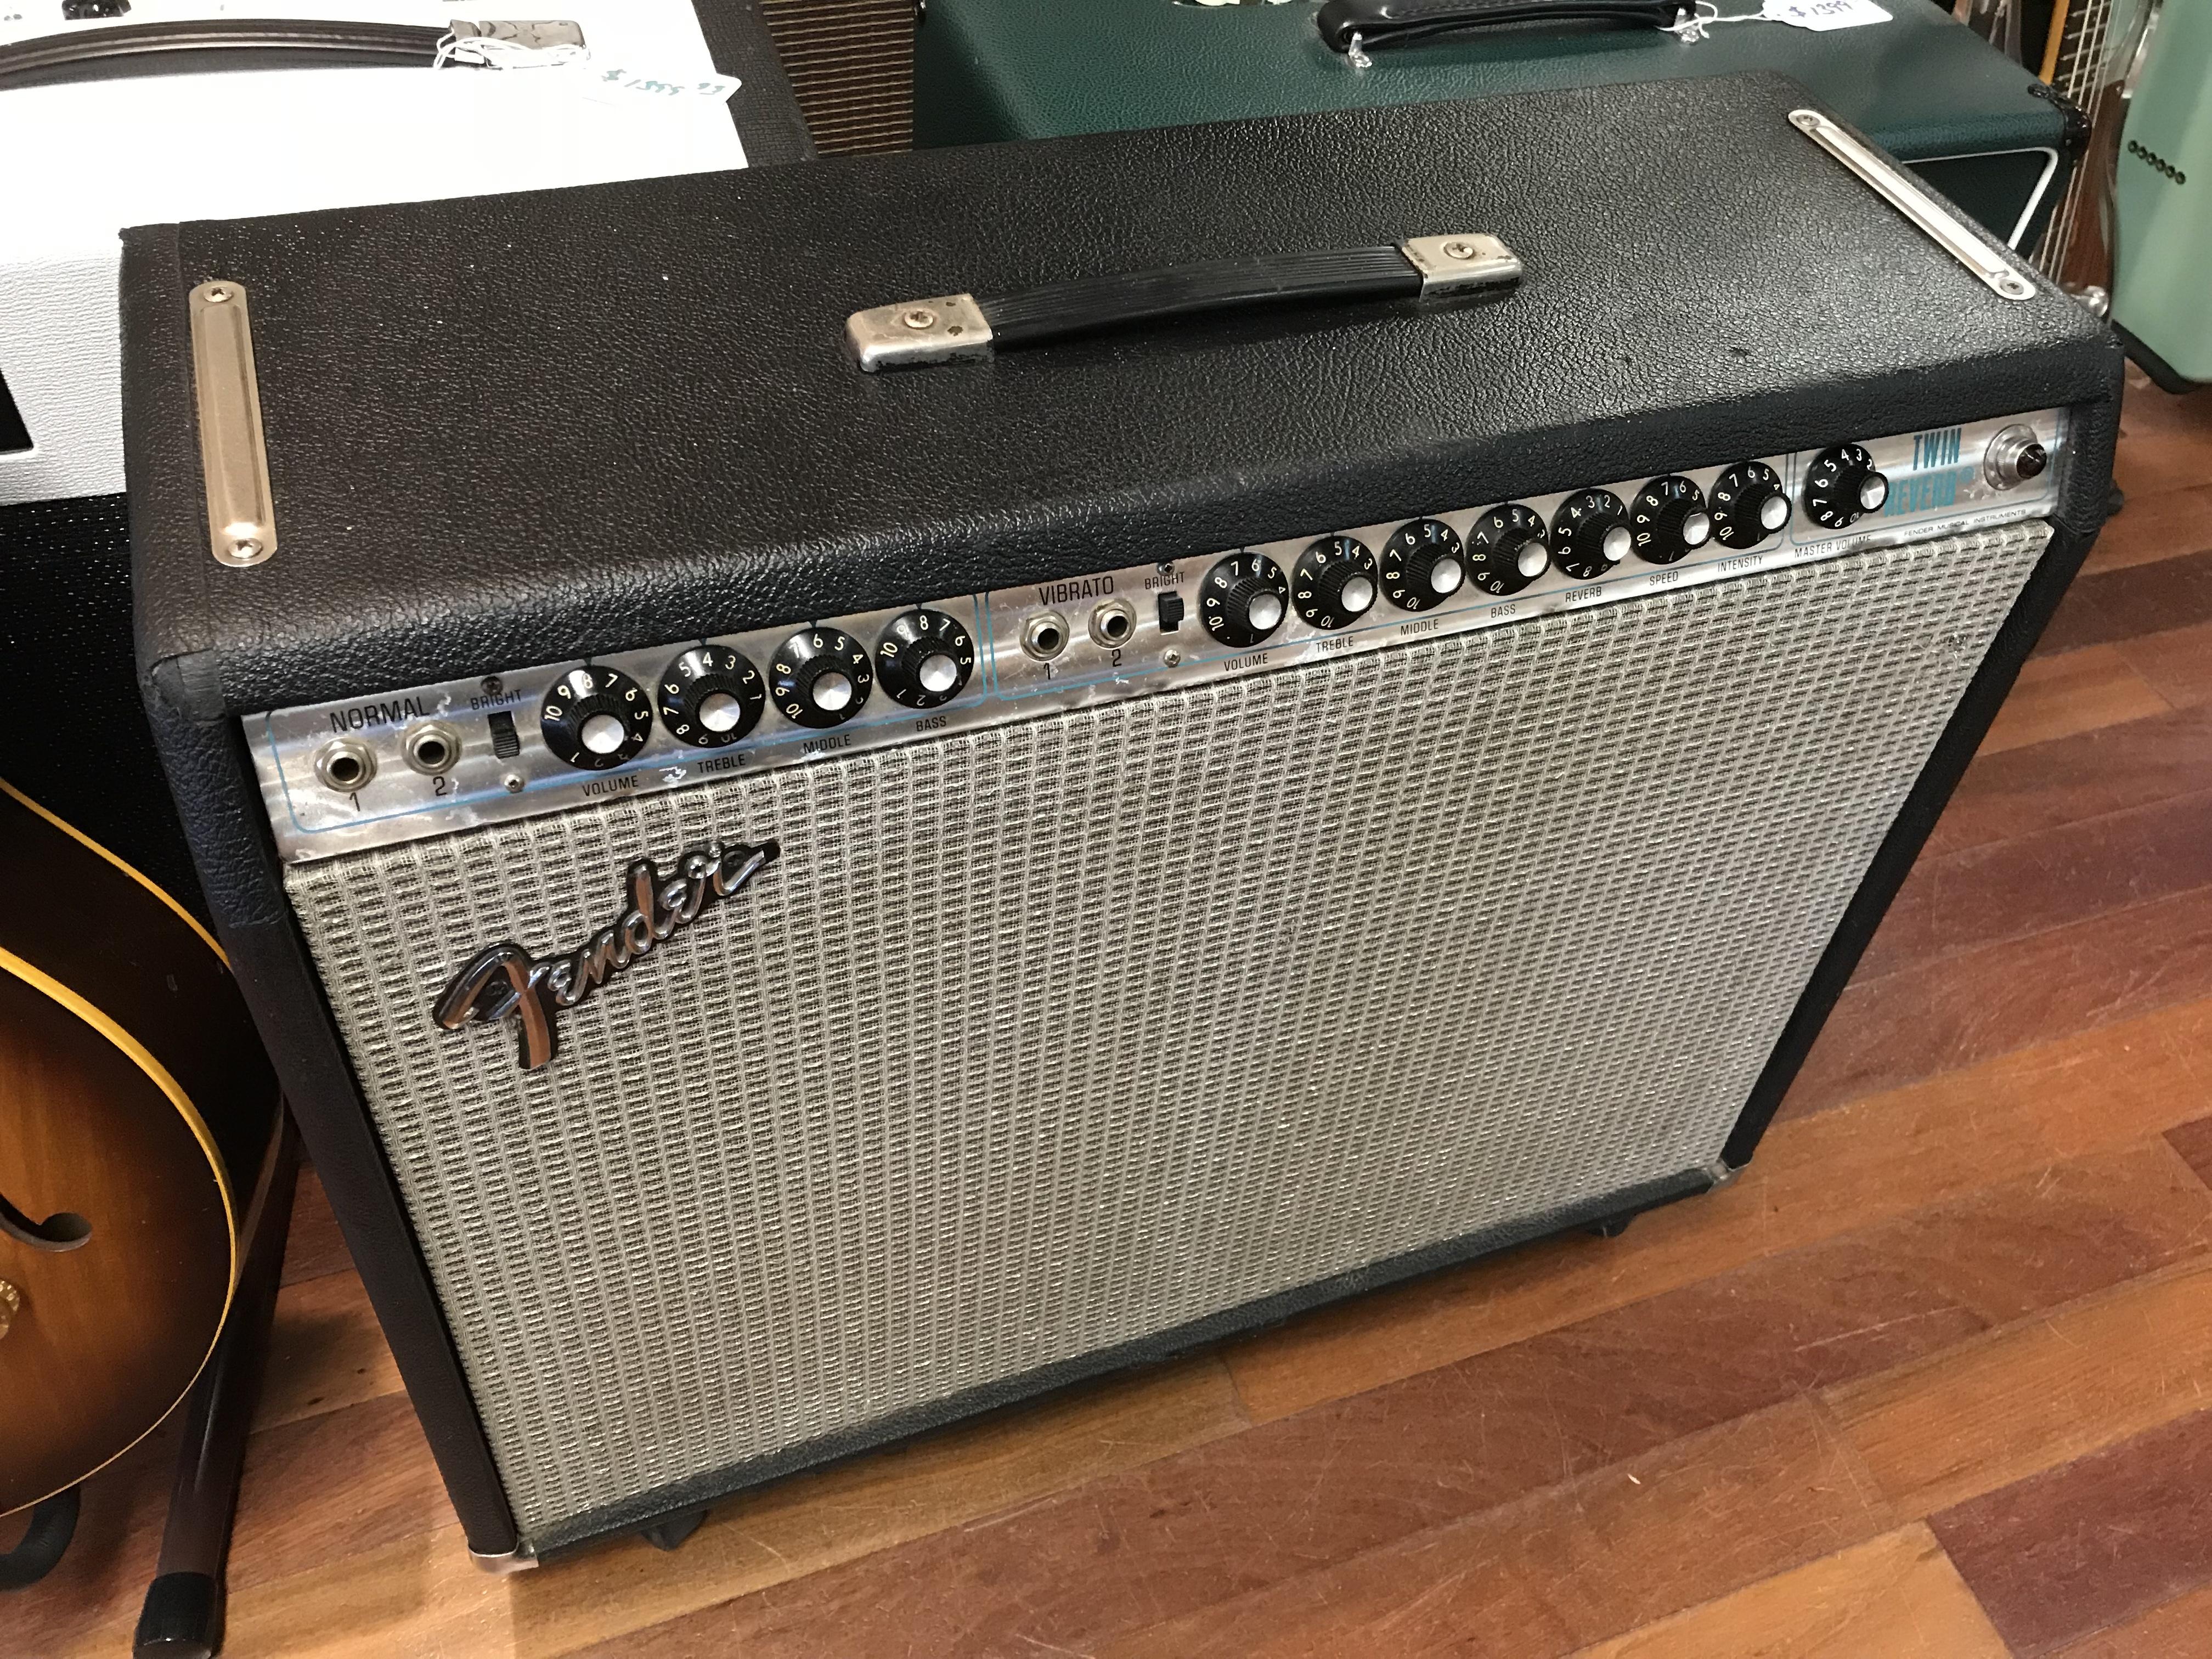 1976 Fender Twin Reverb clean